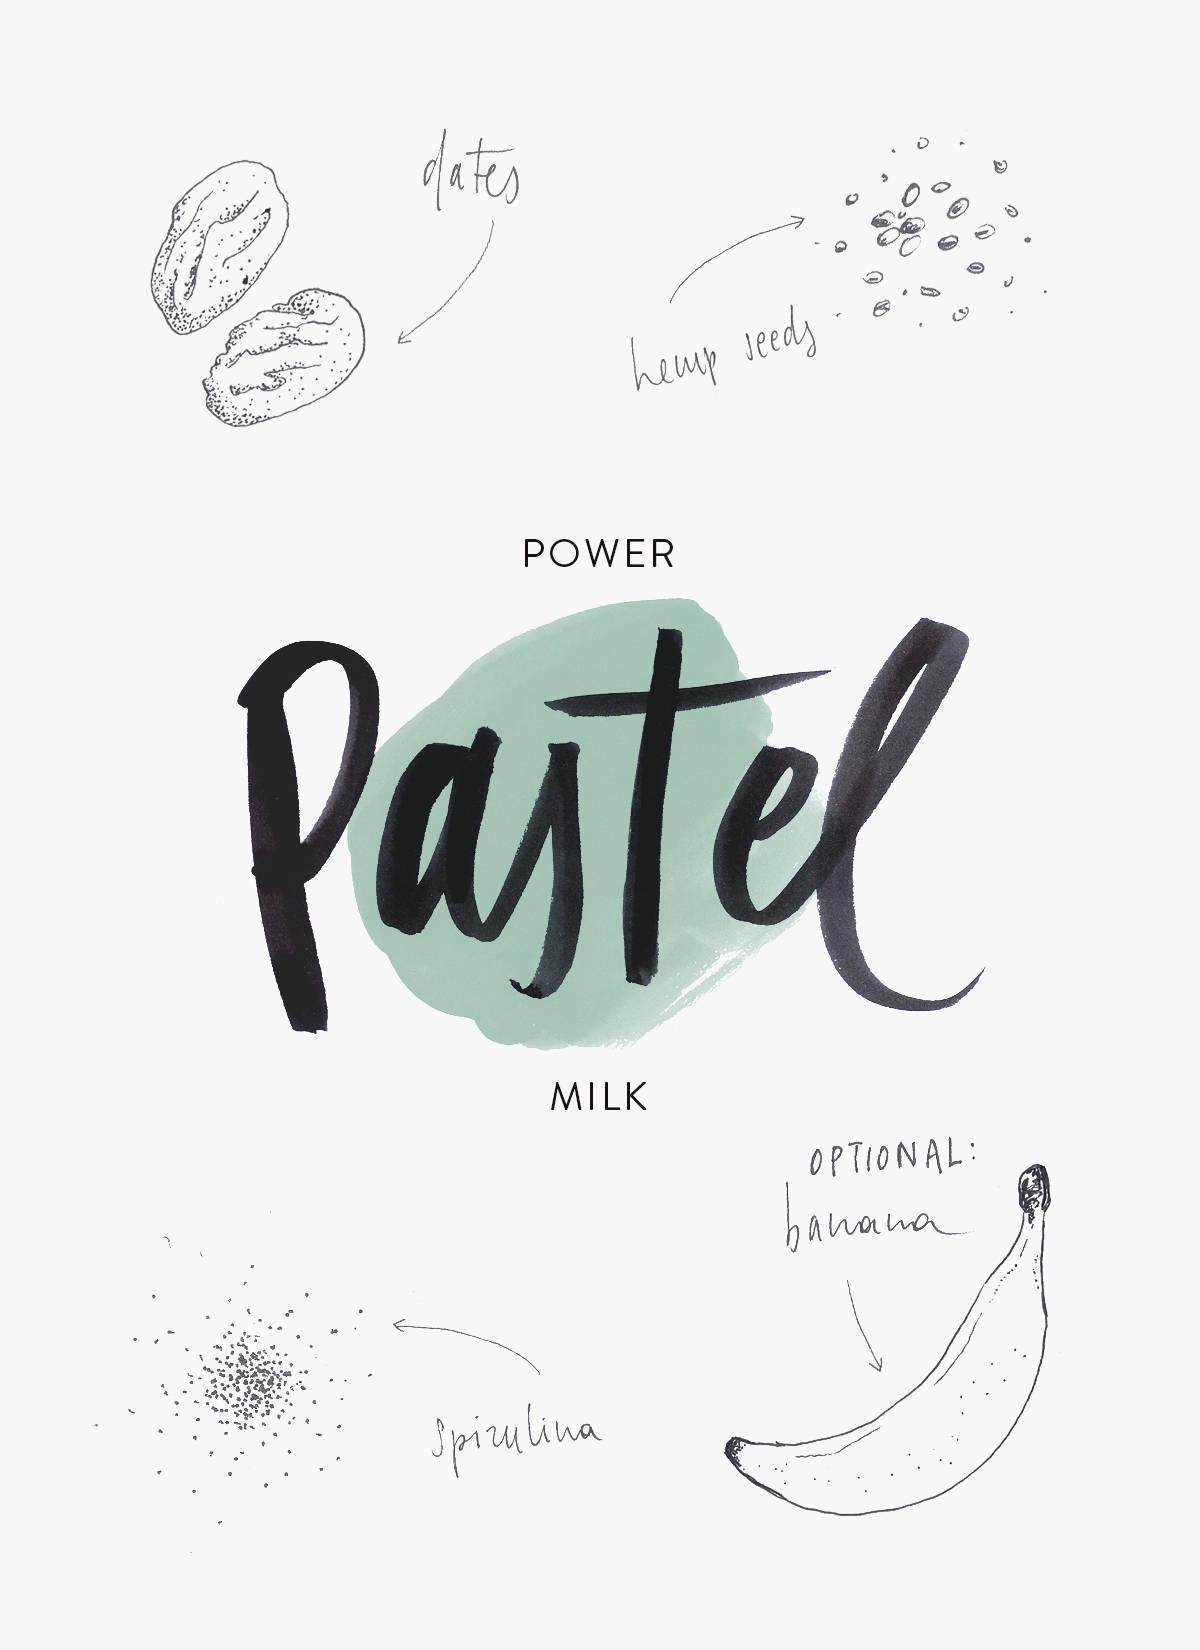 pastel-milk-illustration-kinlake-1